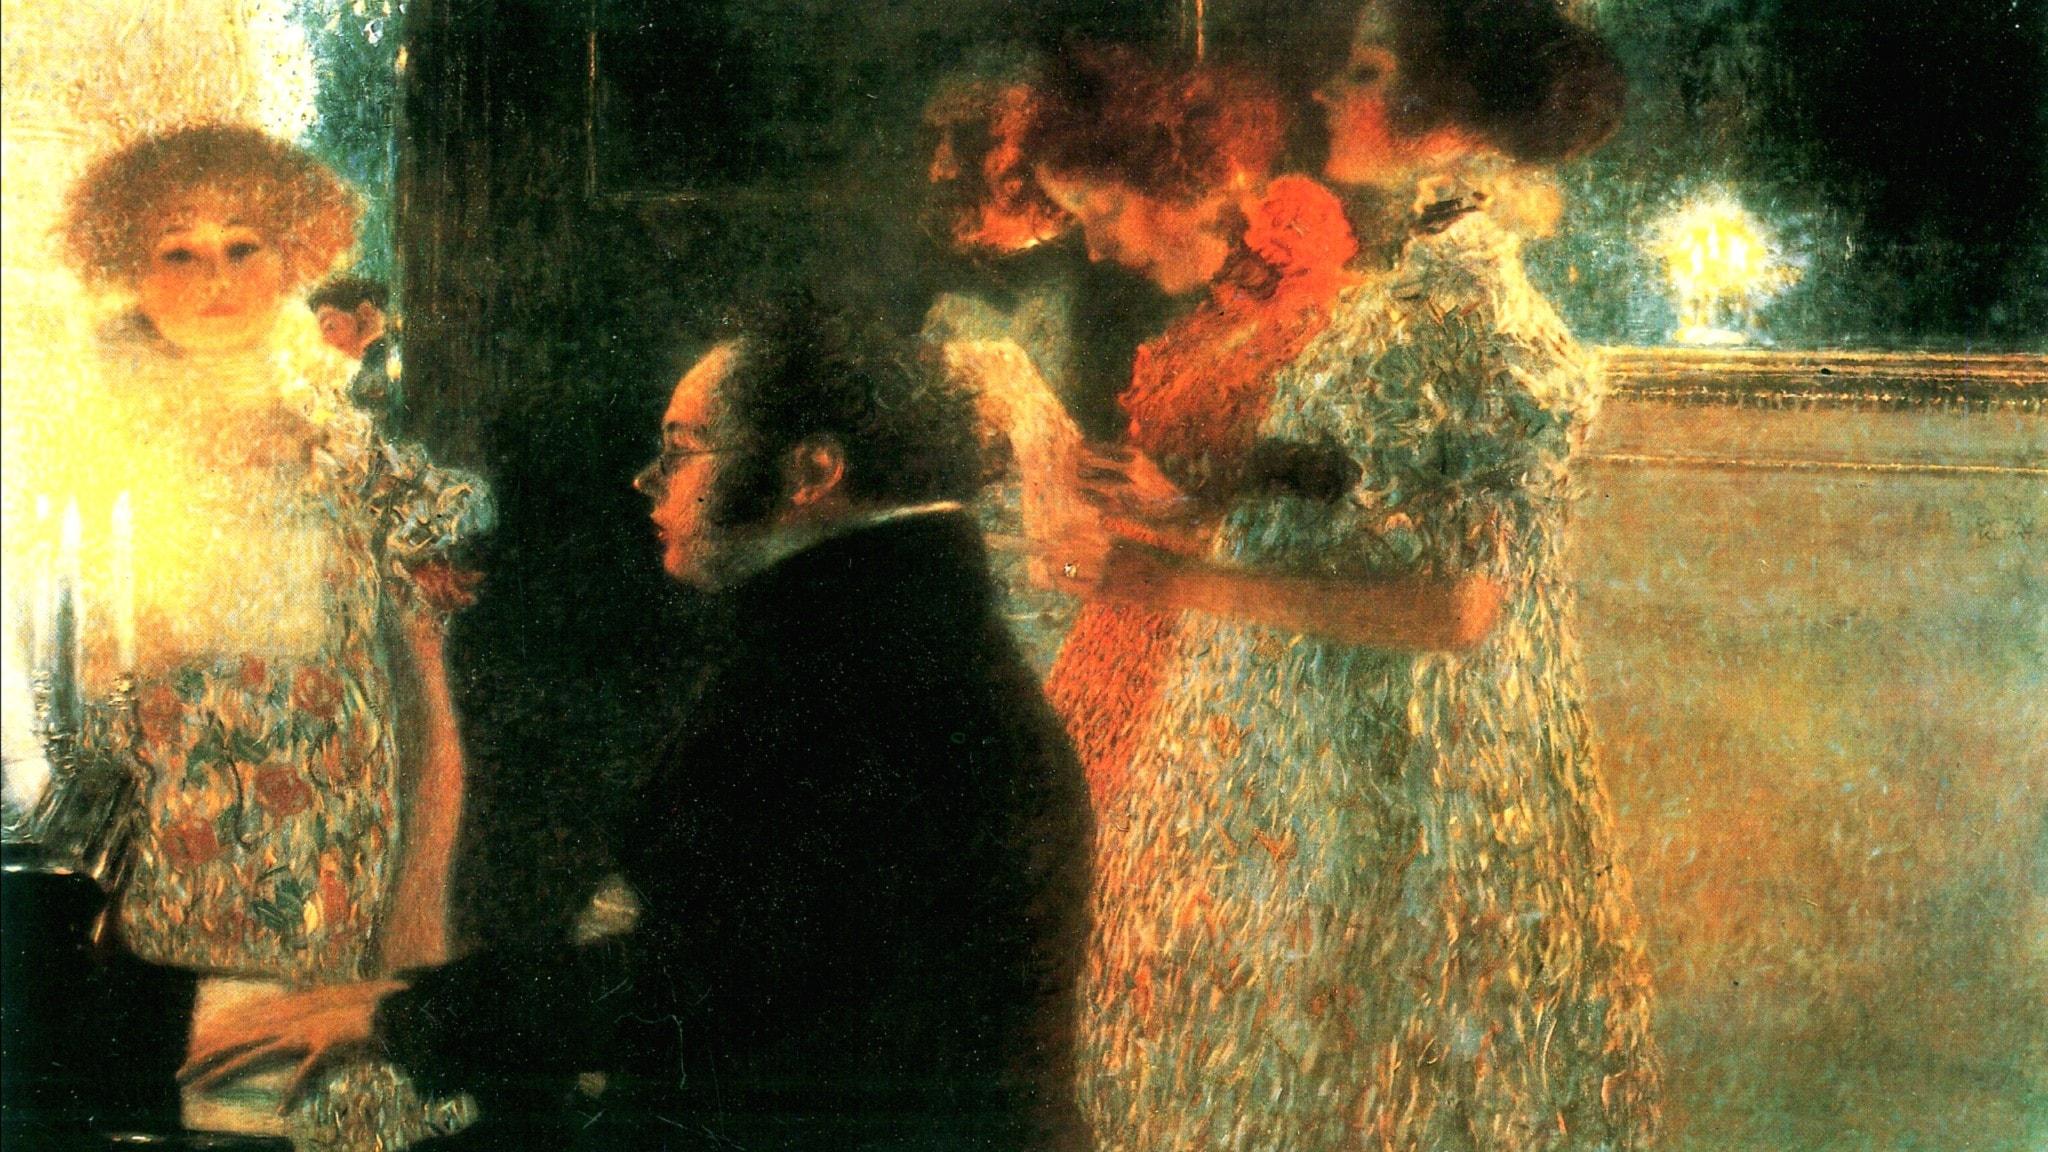 Schubert vid pianot. Gustav Klimt, 1899.